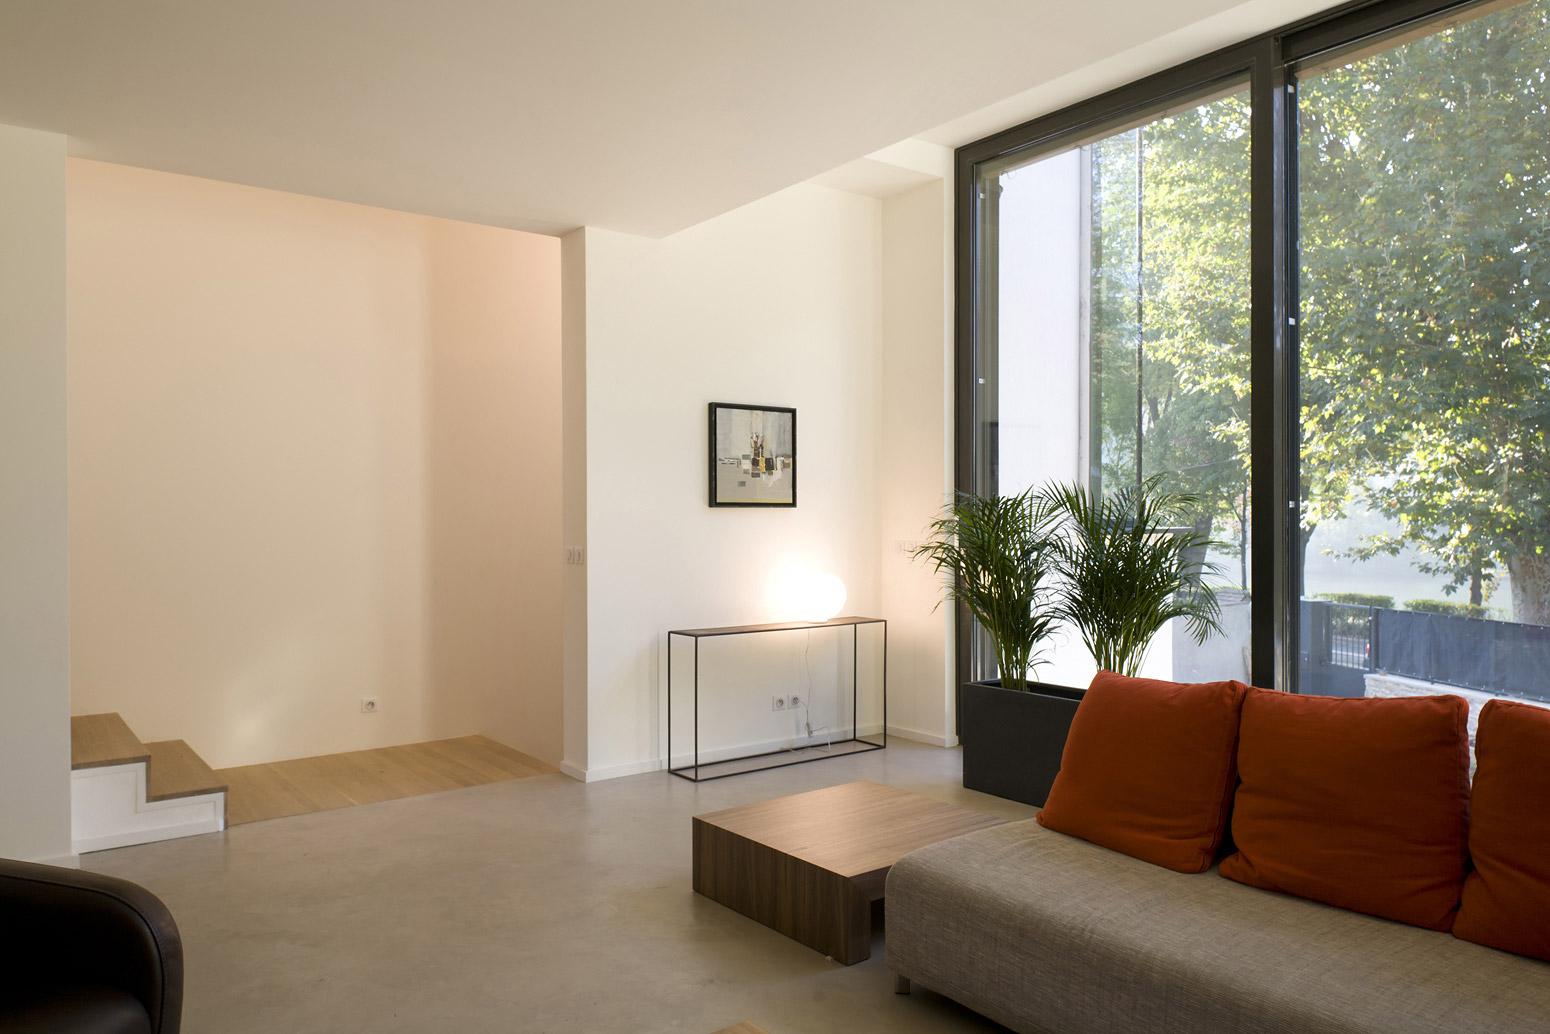 Architecture intérieure ABN - Jerome RICOLLEAUJerome RICOLLEAU